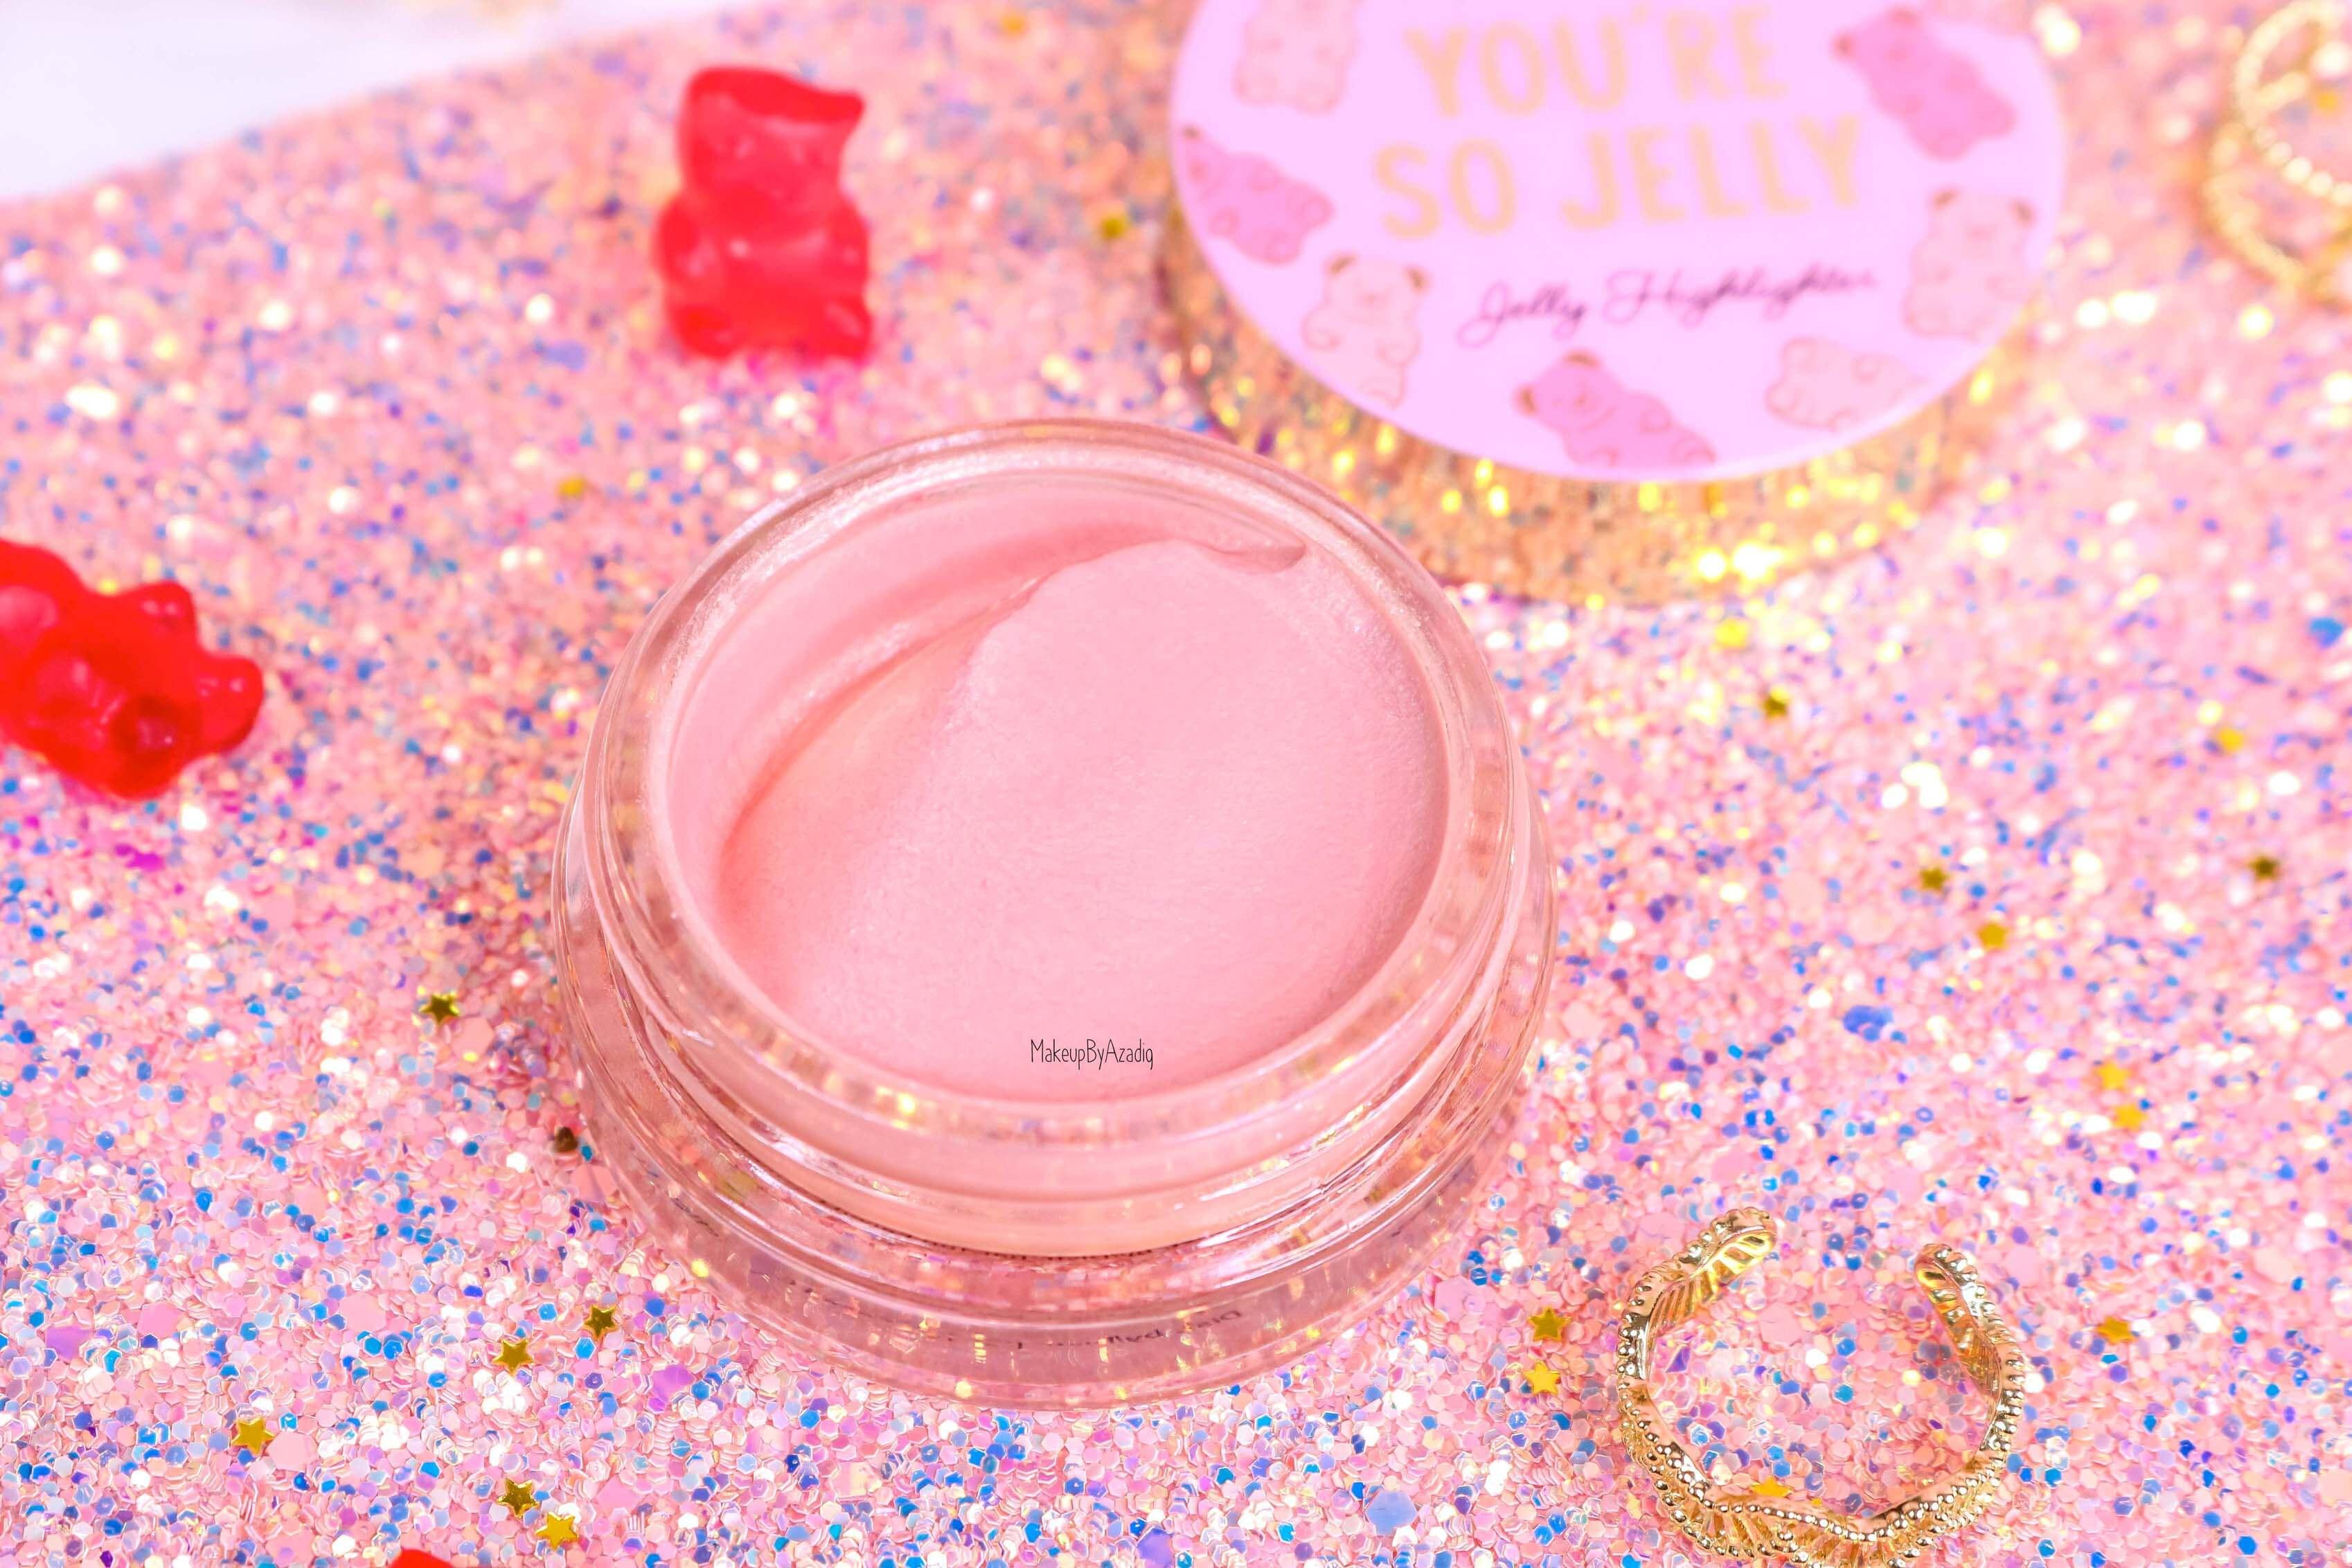 revue-highlighter-jelly-gel-rose-pink-too-faced-texture-cute-avis-prix-swatch-makeupbyazadig-sephora-france-glitter